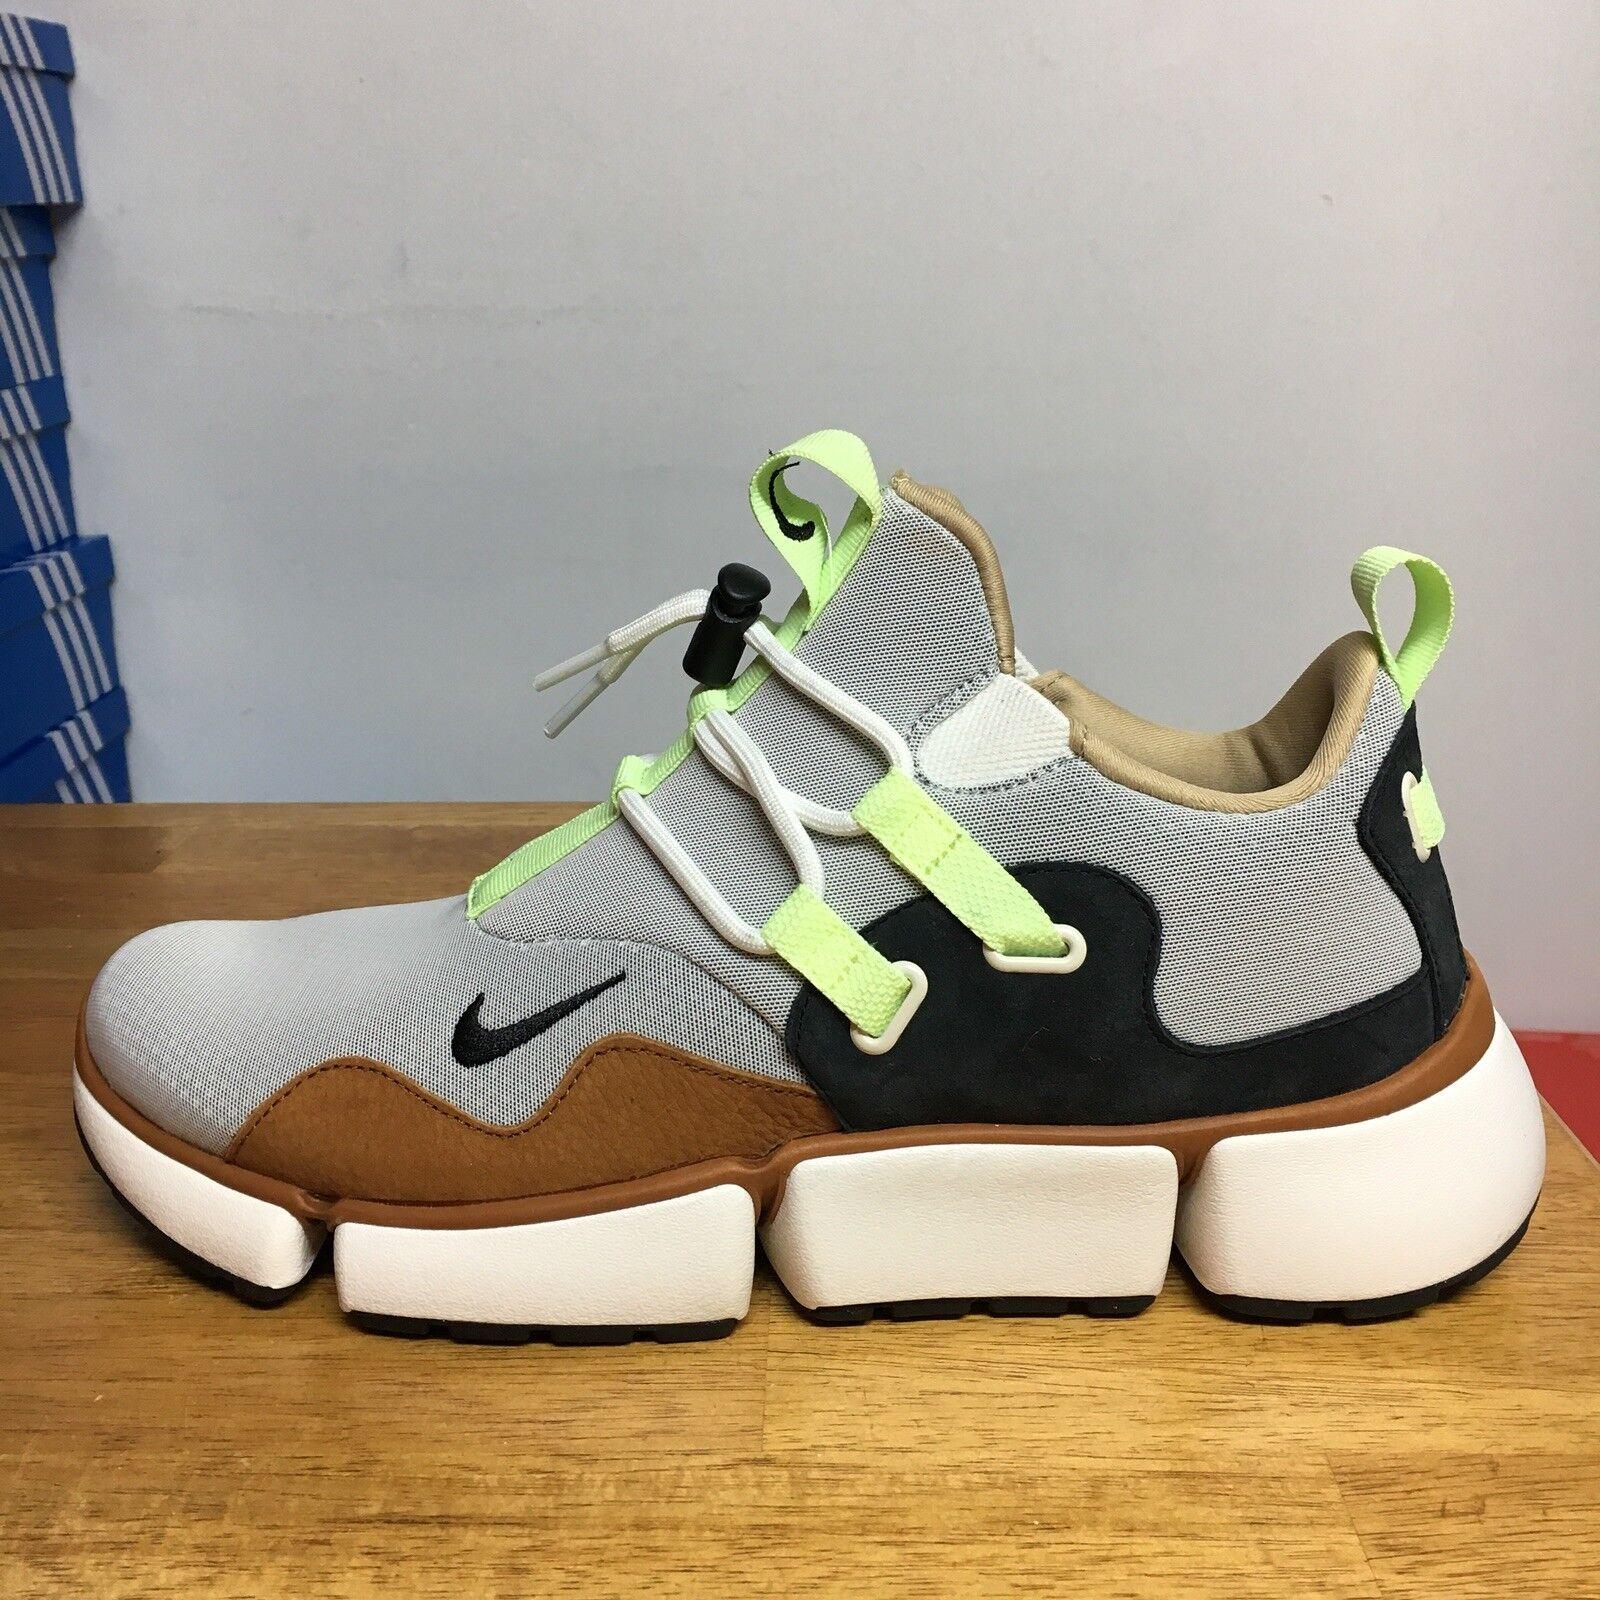 Mens Nike NikeLab Pocketknife DM 910571-201 Tawny/Black Brand New Size 9.5